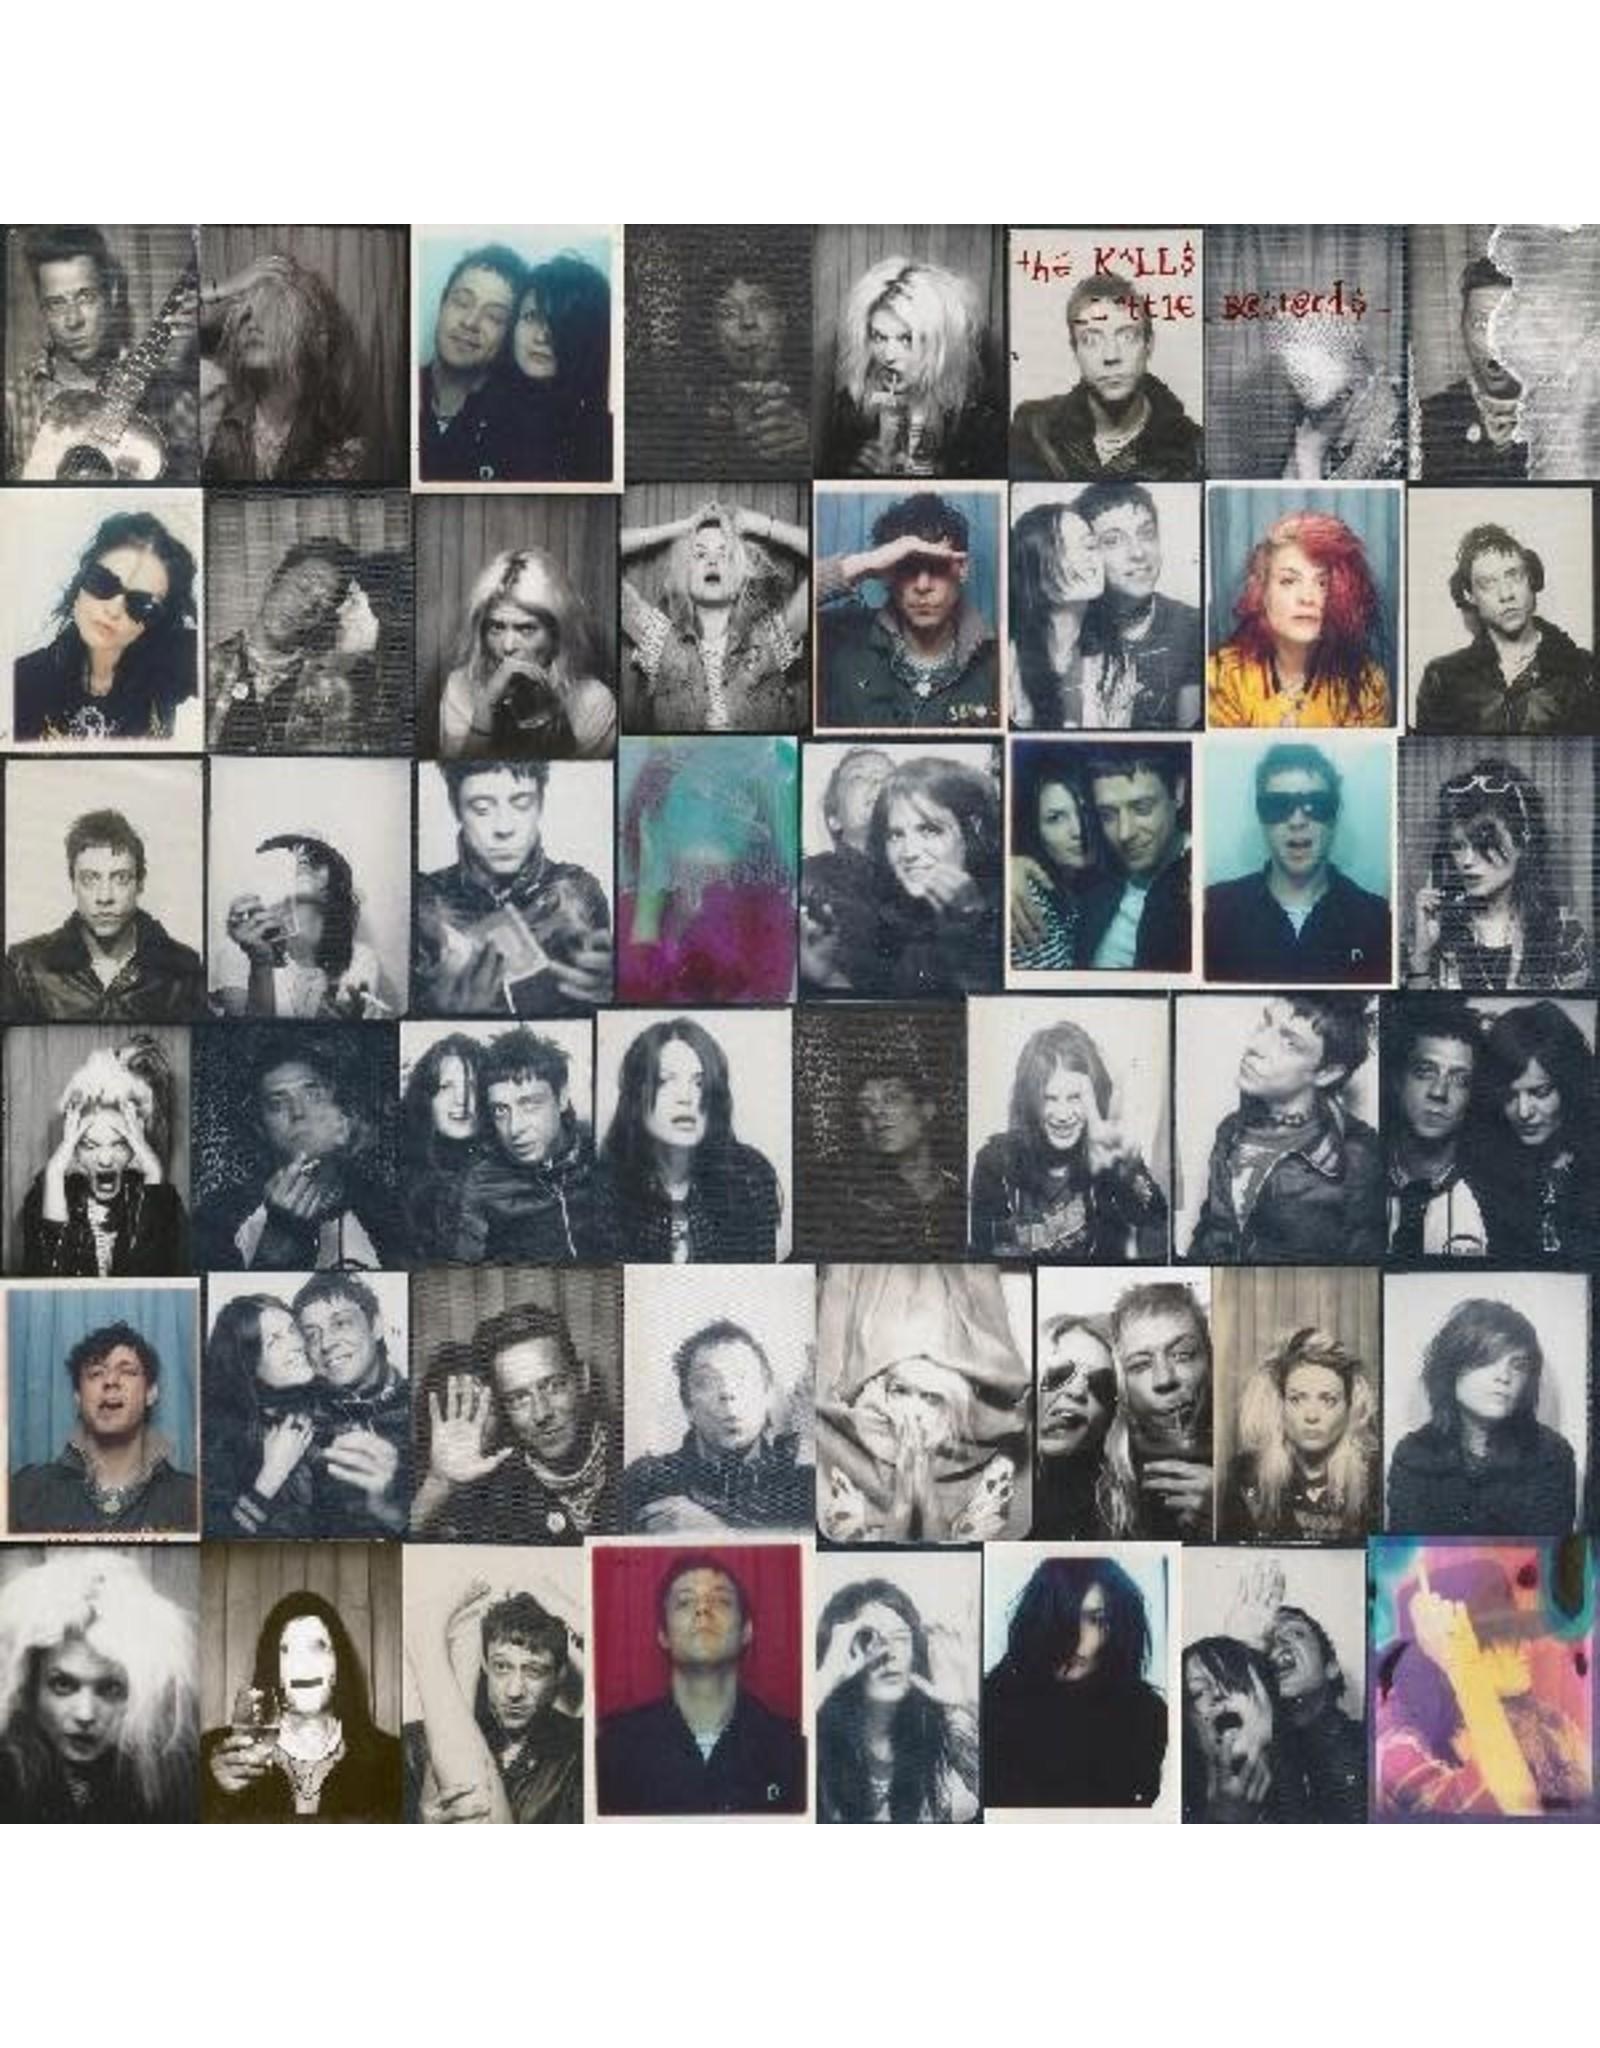 New Vinyl The Kills - Little Bastards 2LP